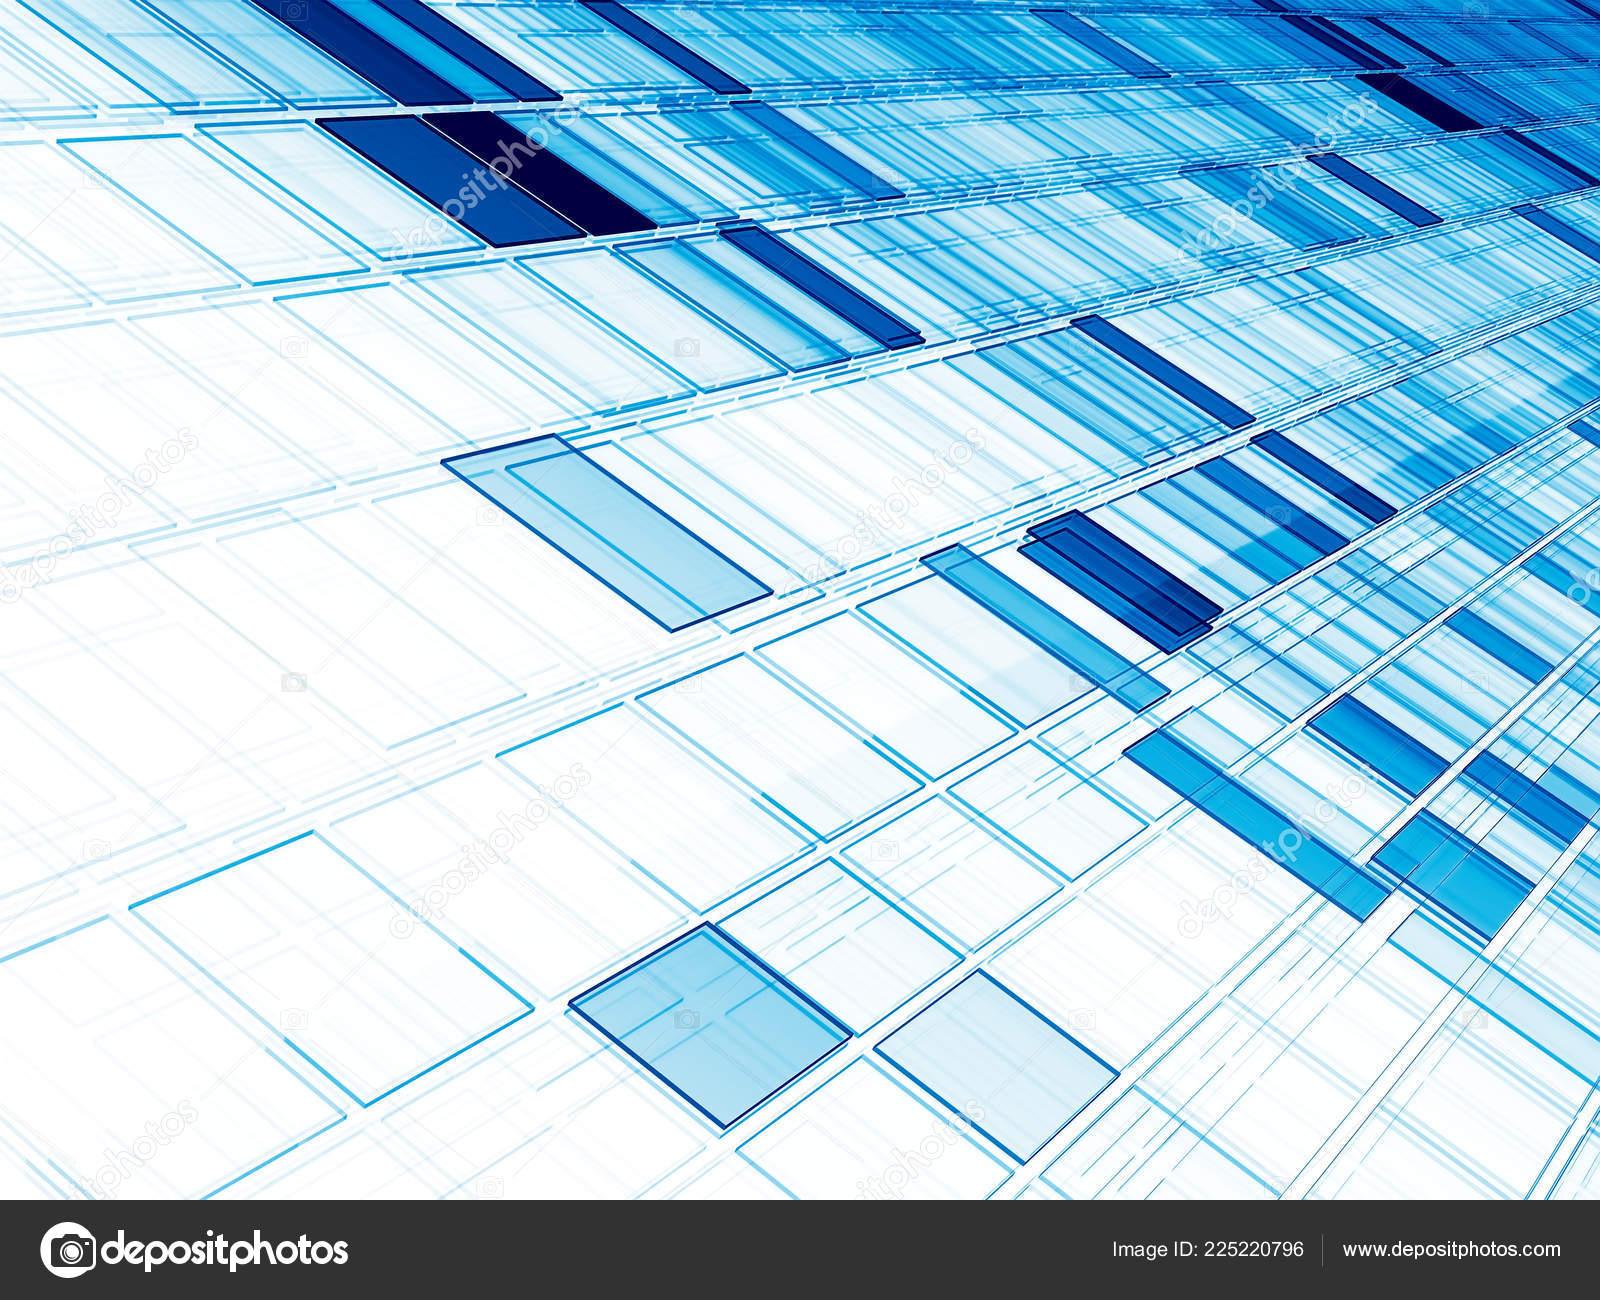 Sao Paulo Wallpaper Desktop Blue White Diagonal Tiles